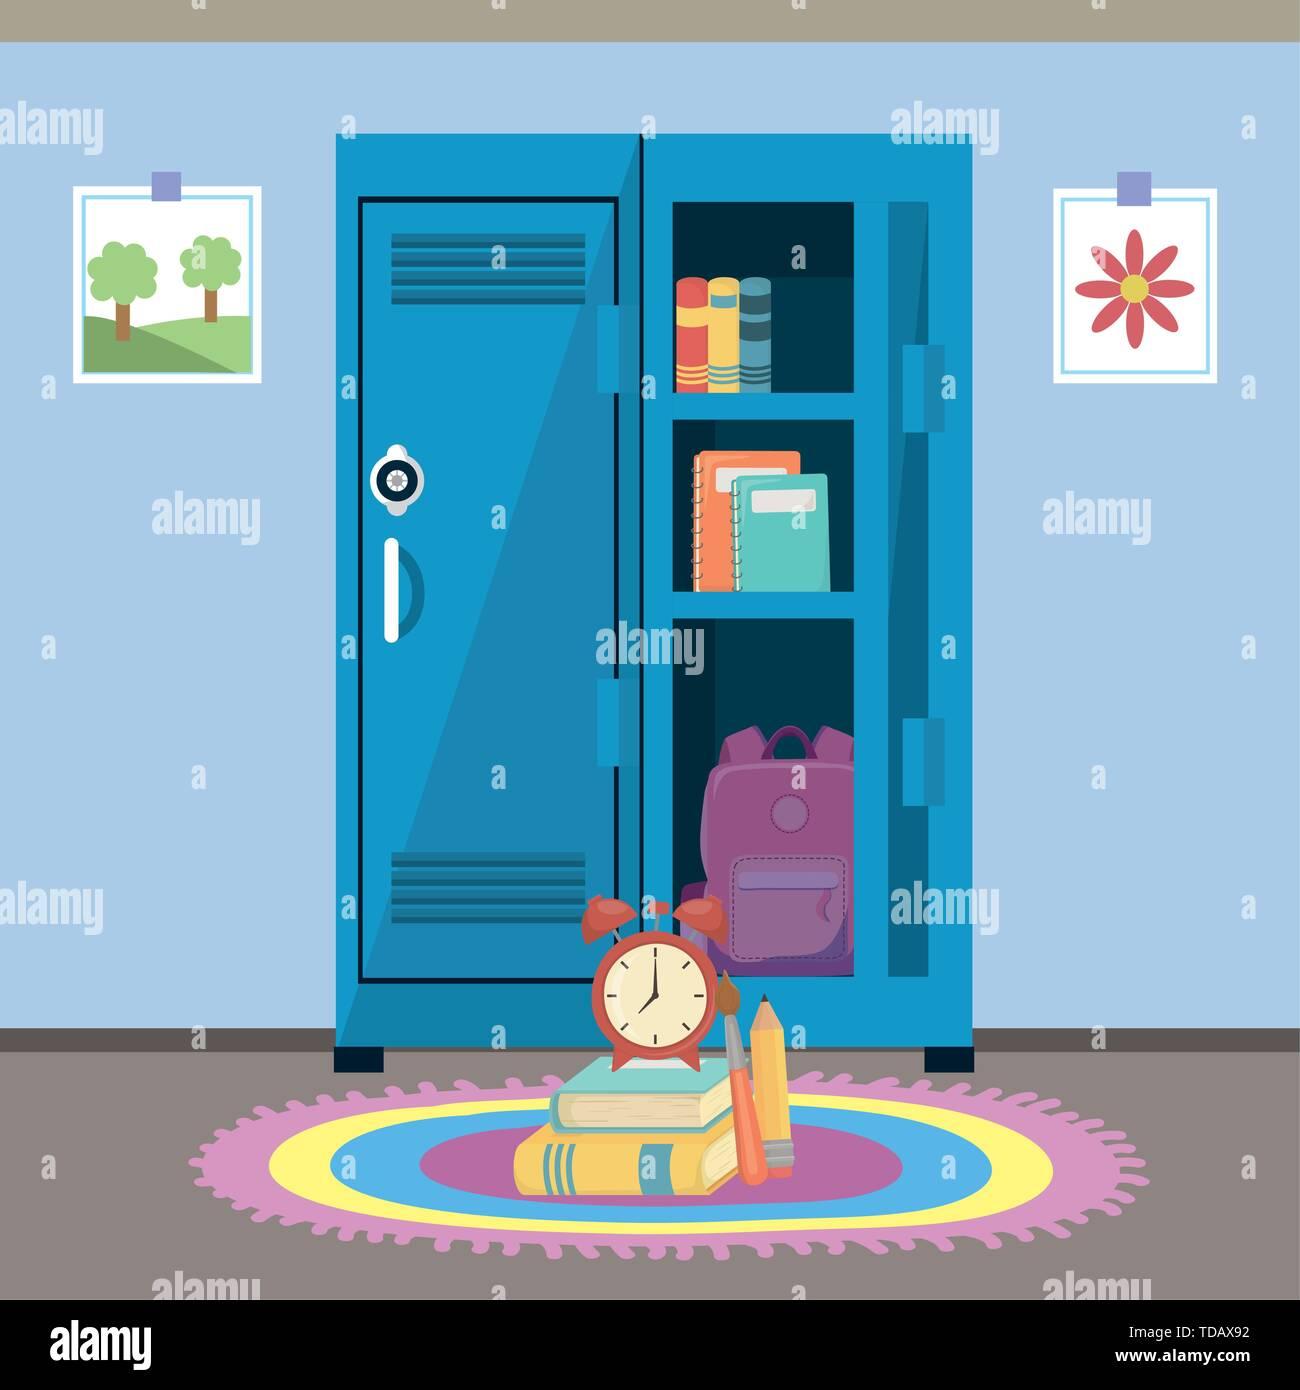 Locker design, School supply object education study lesson